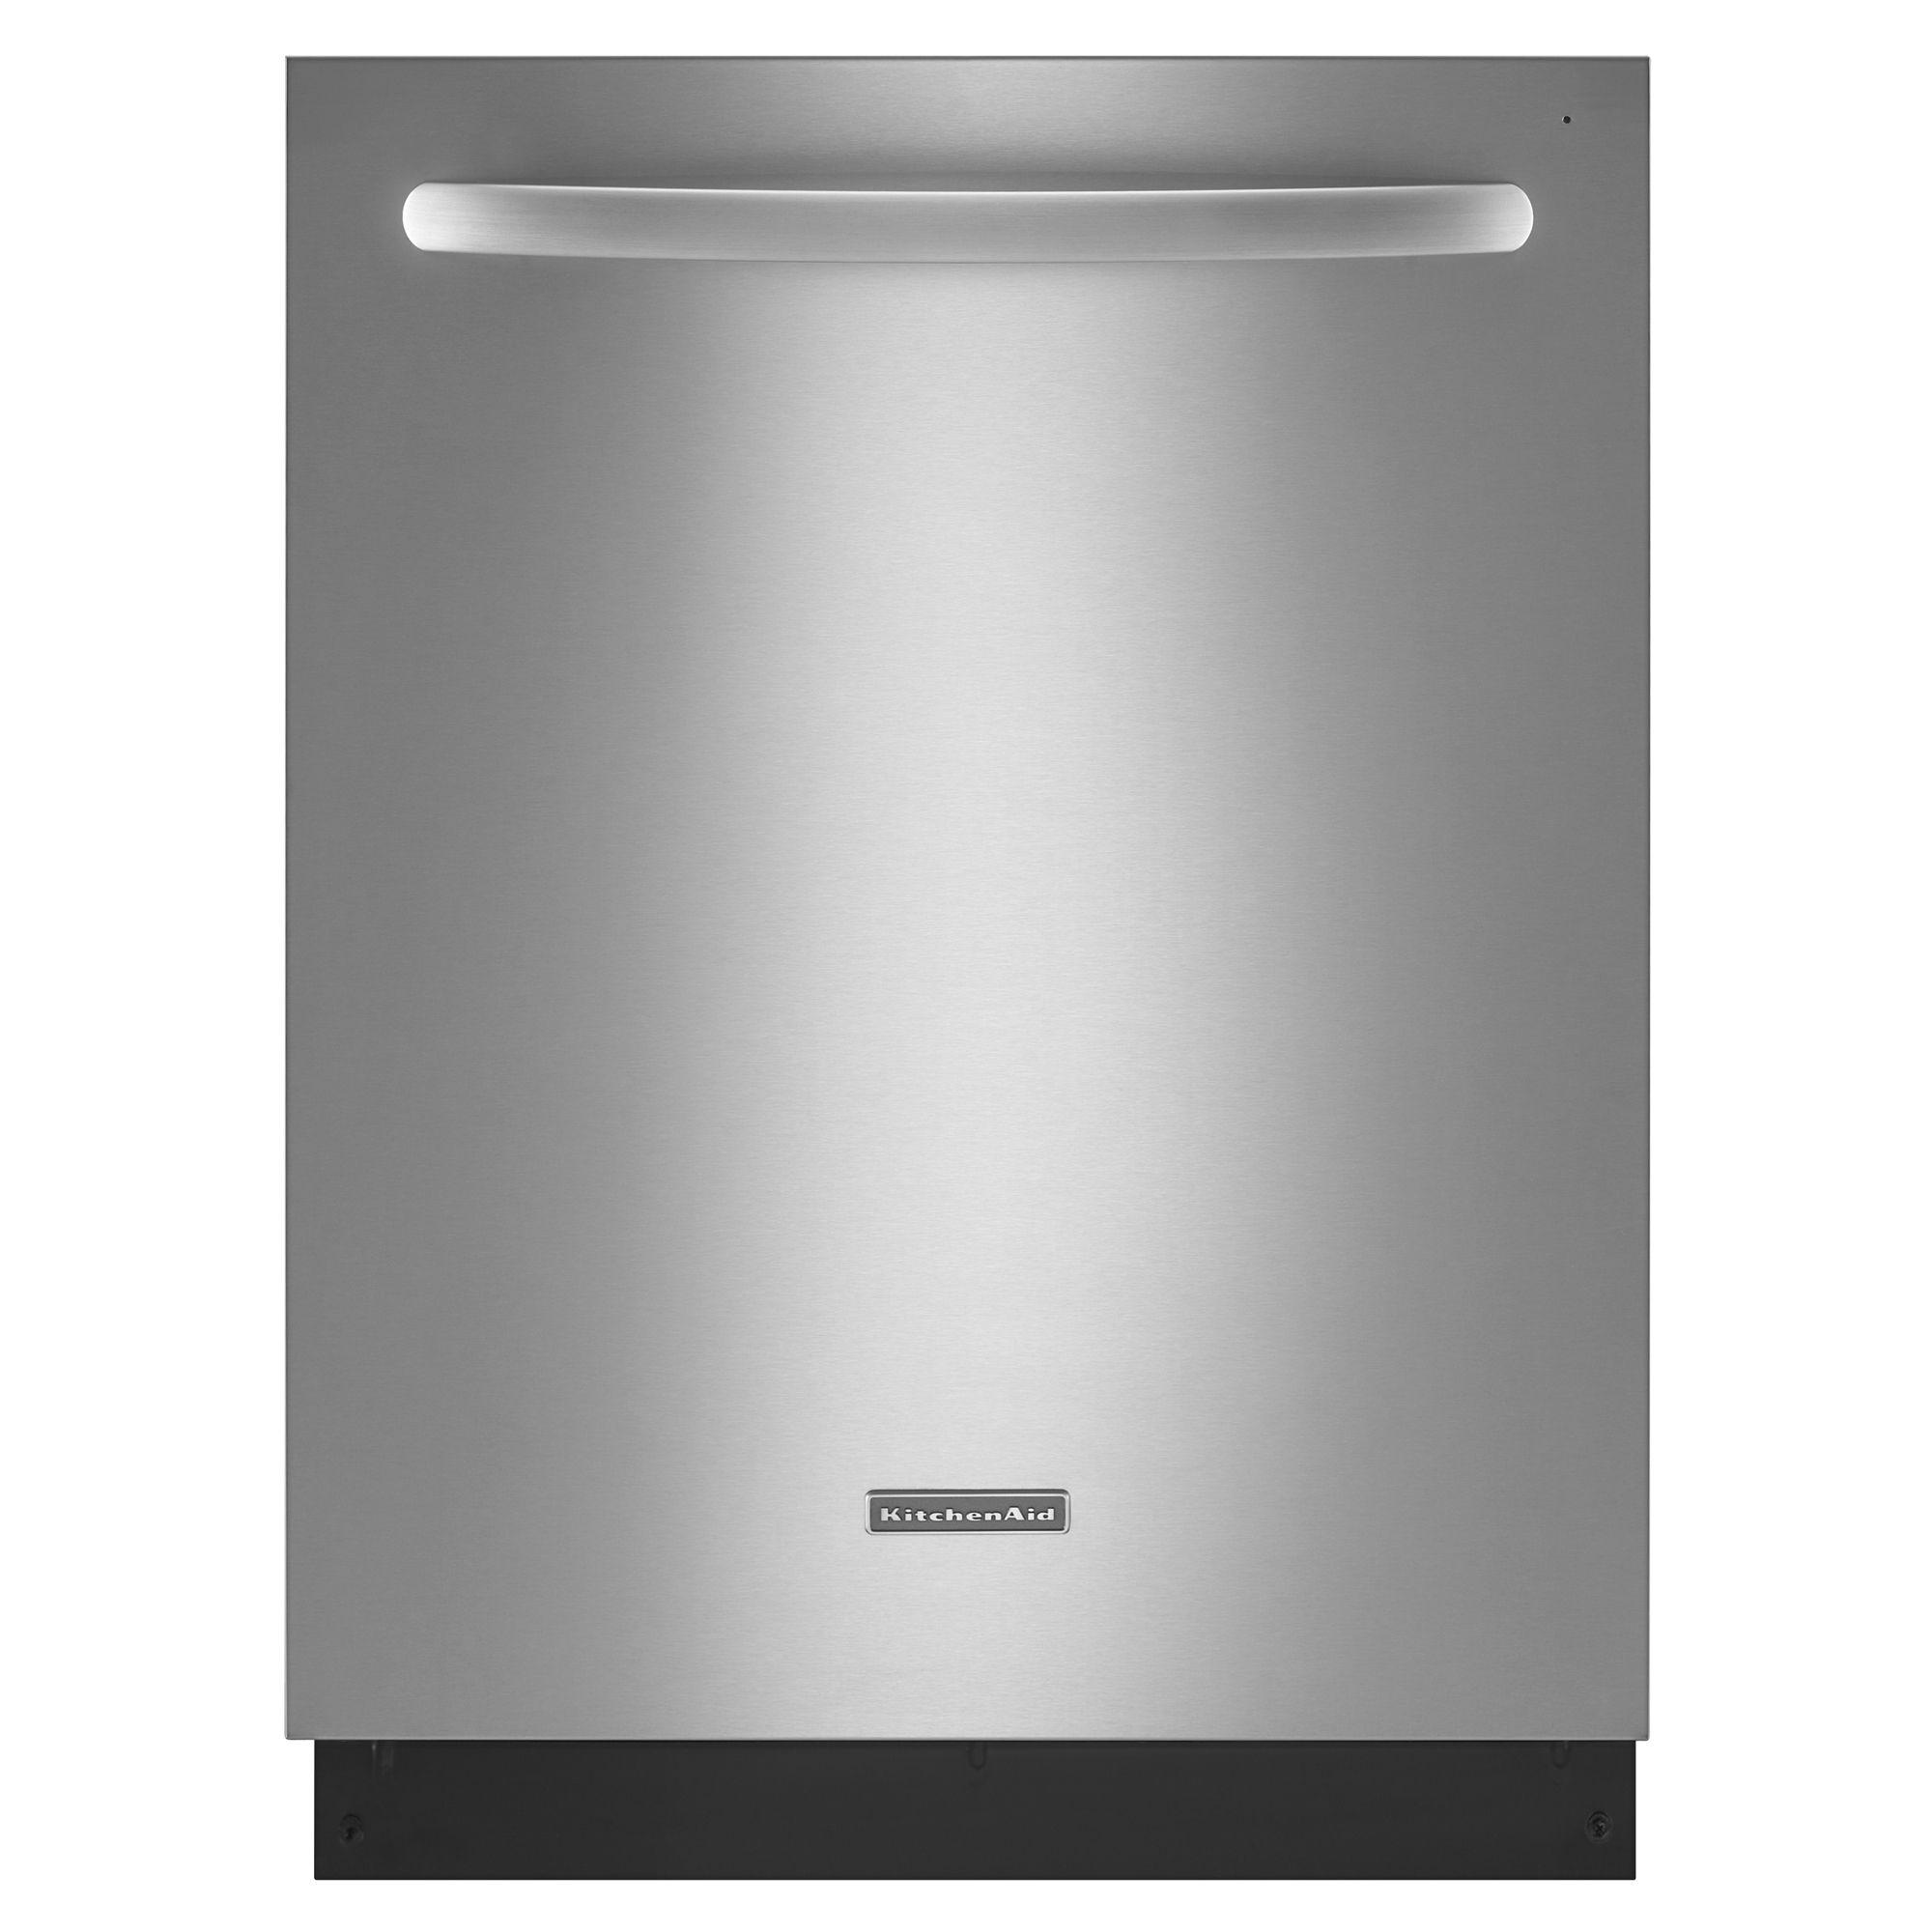 KitchenAid Dishwasher Stainless Steel